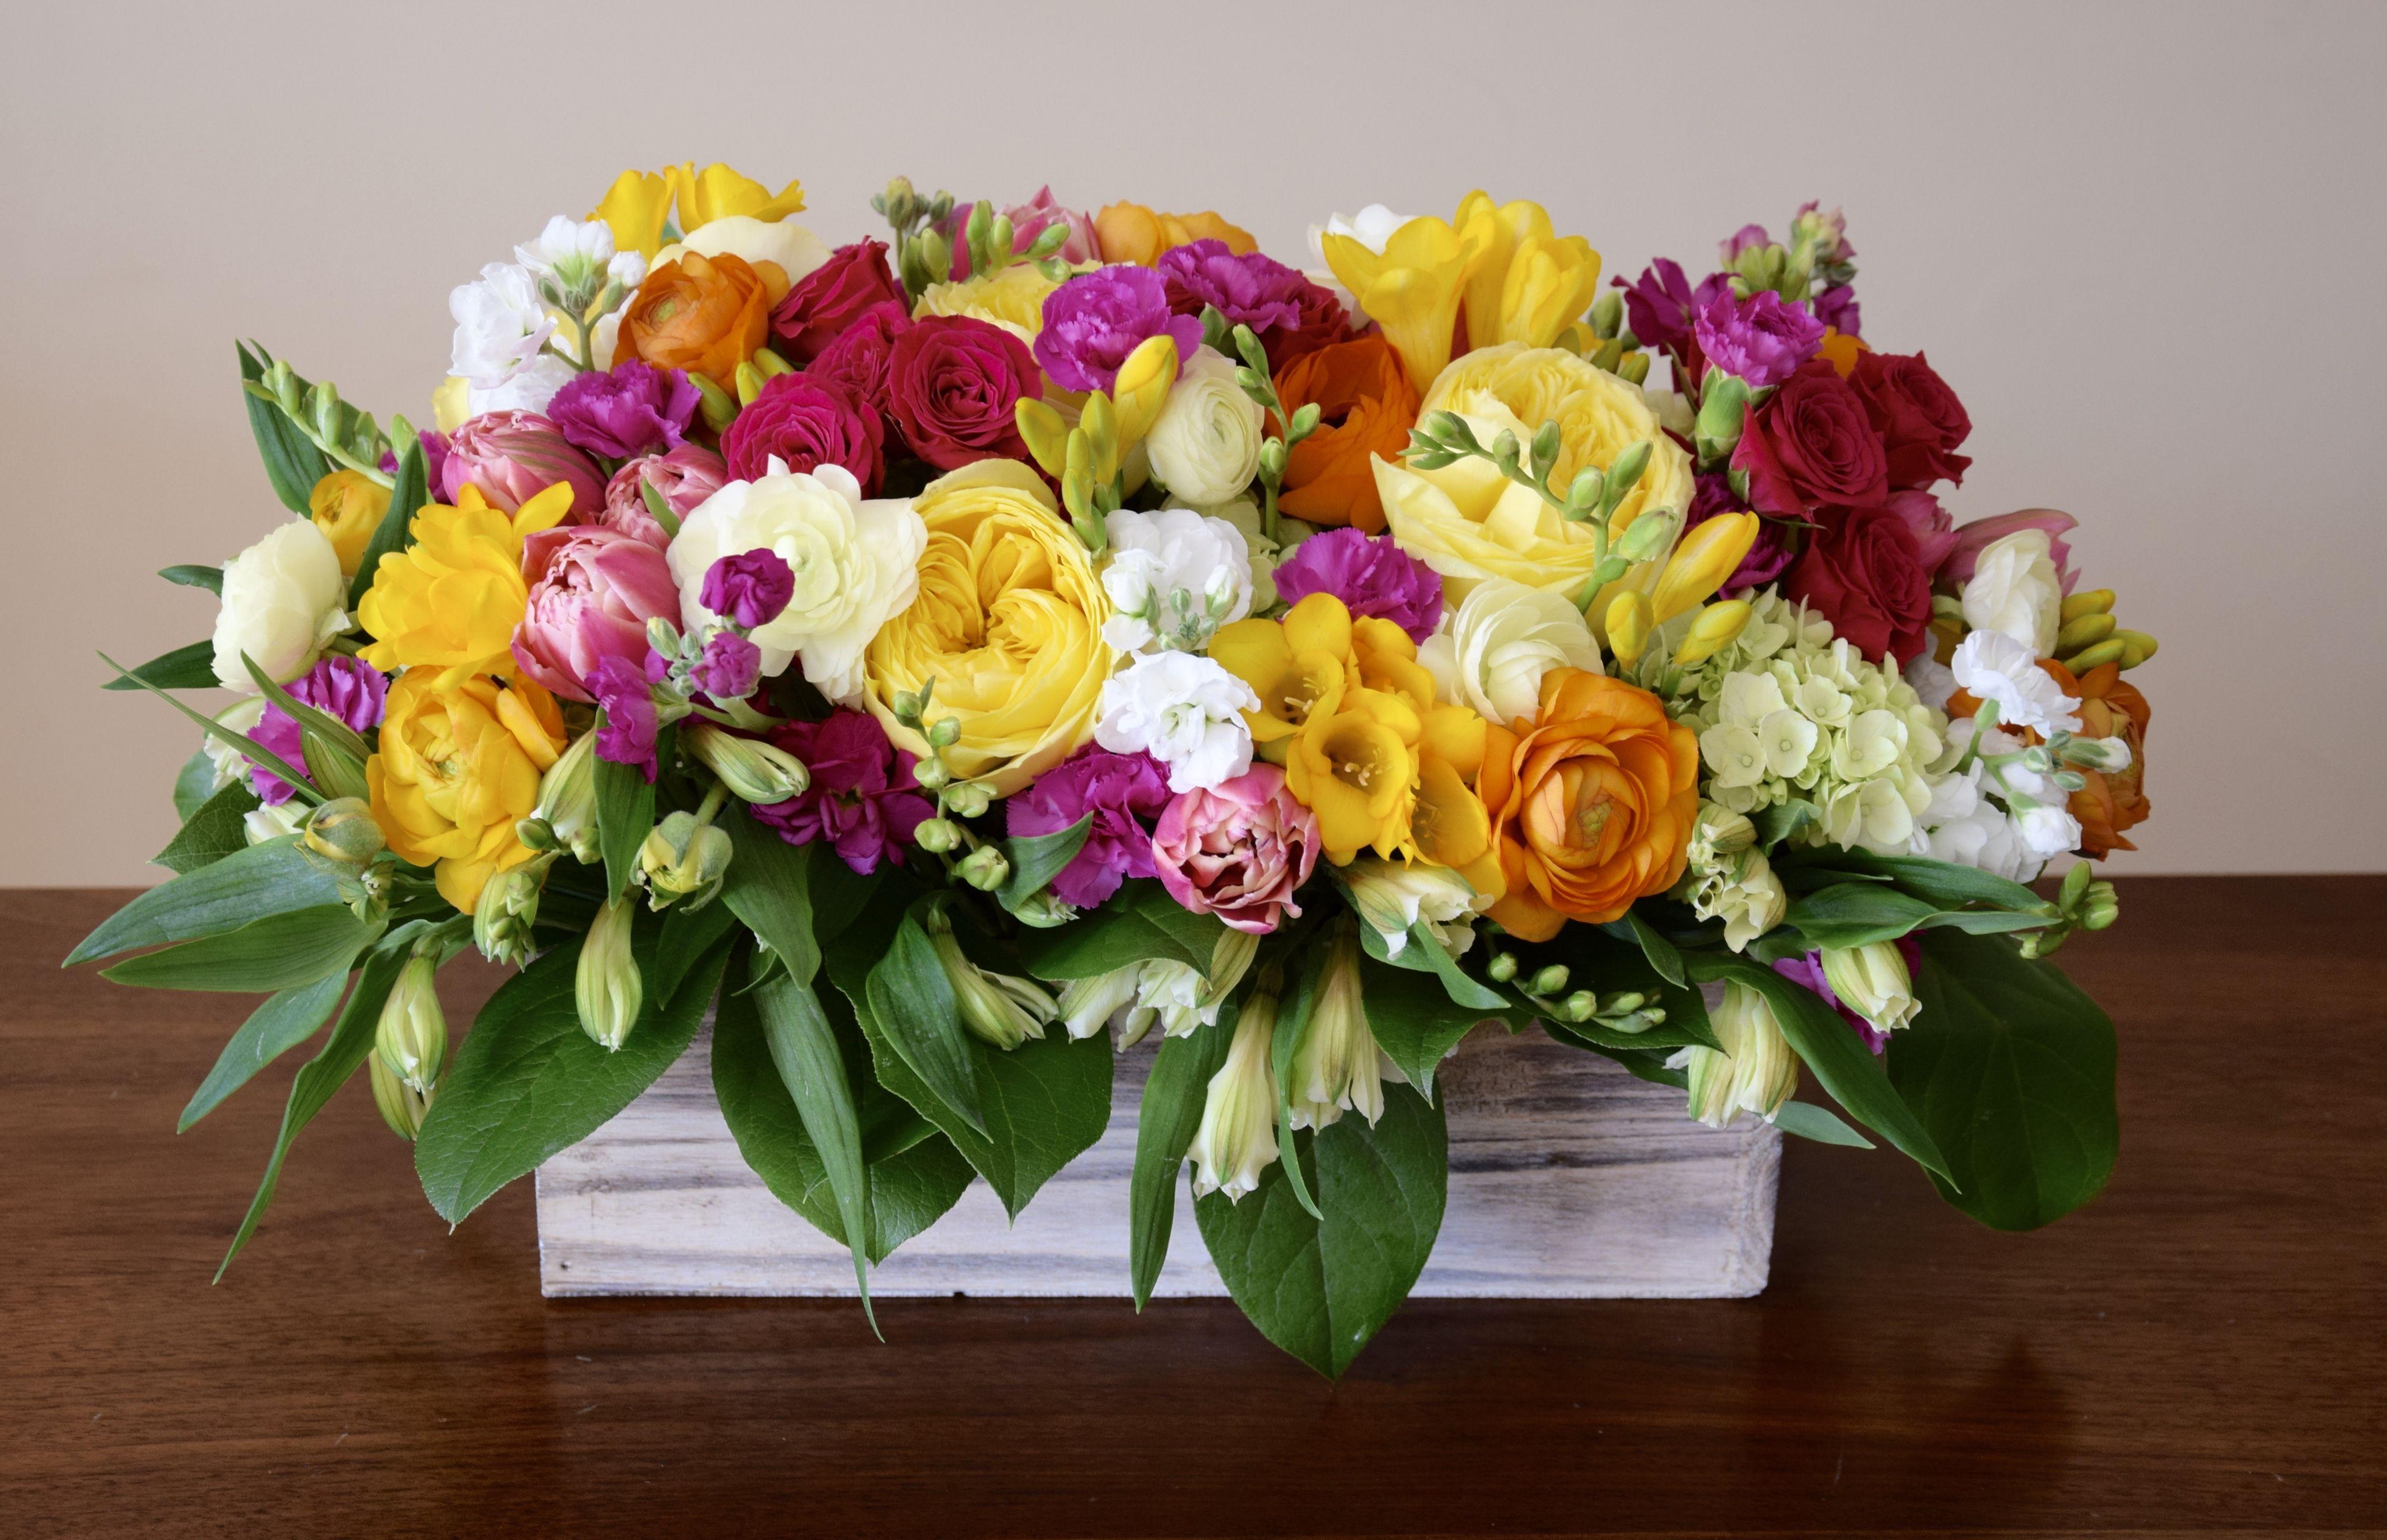 Vibrant Color Spring Garden Flower Arrangement With Lots Of